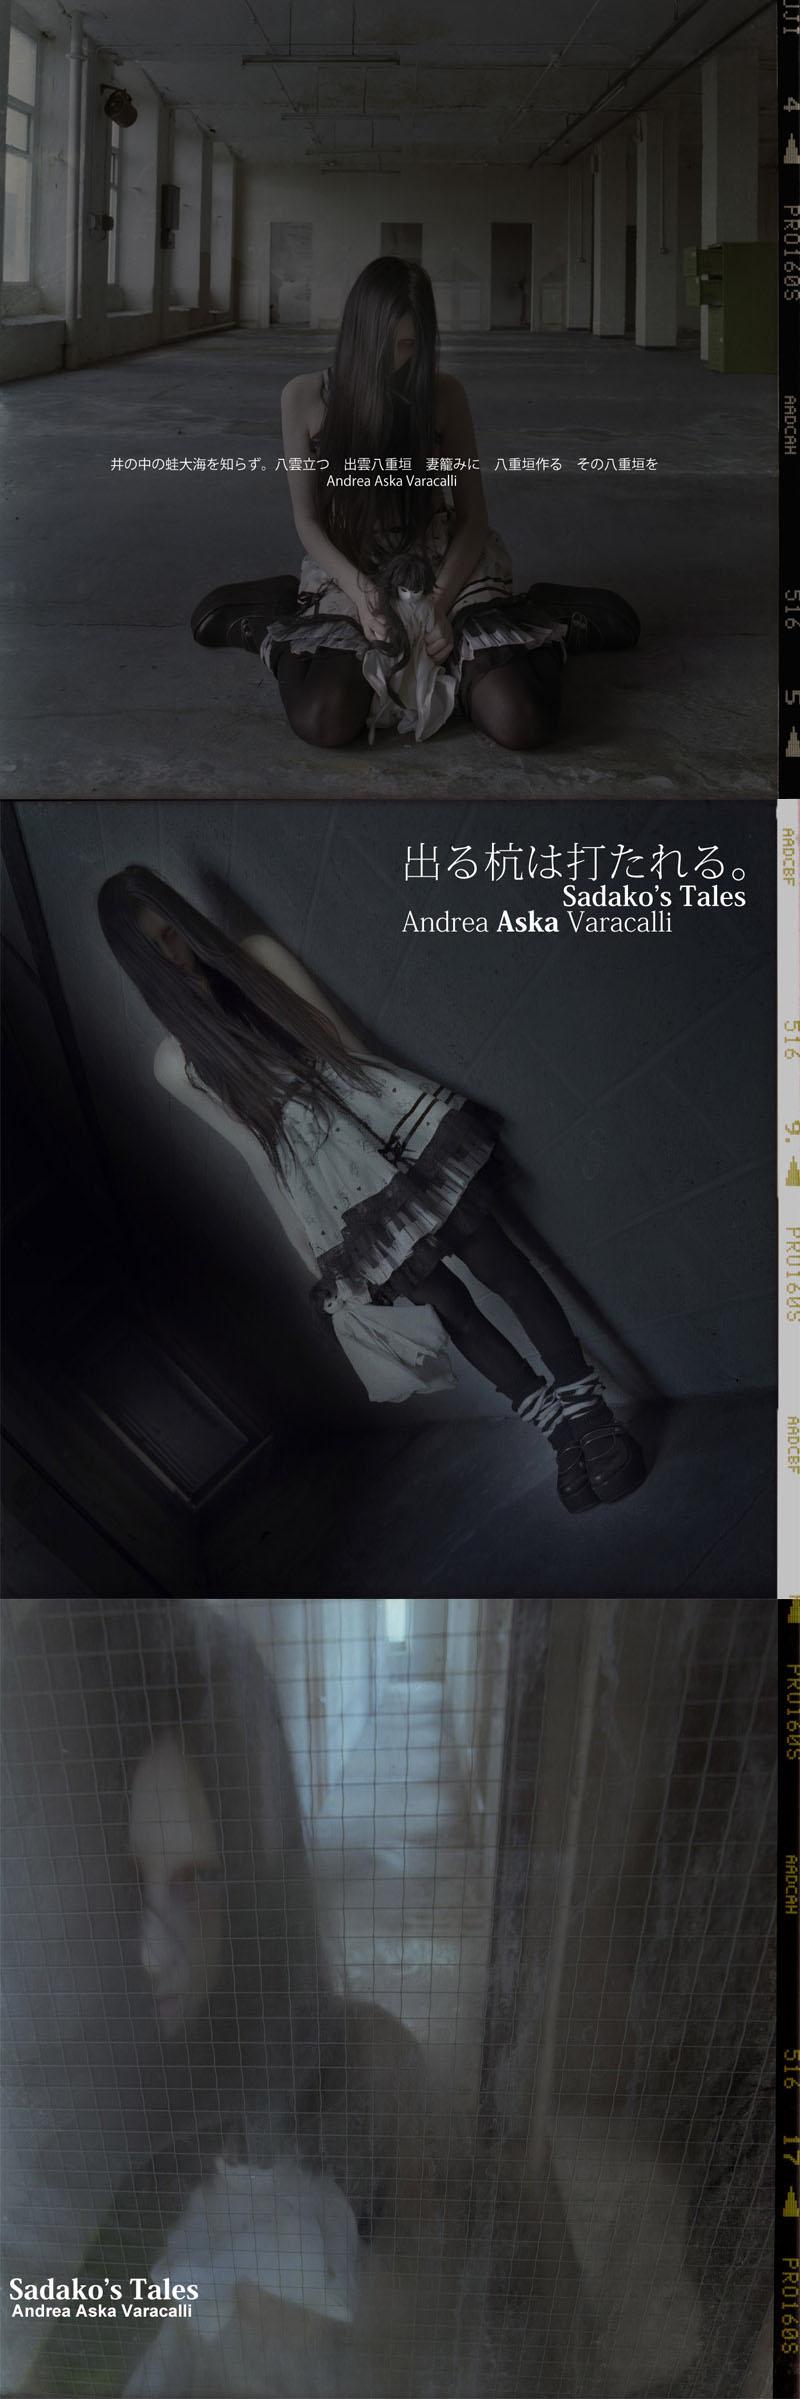 Osaka Mar 15, 2011 Andrea Aska Varacalli Sadakos Tales